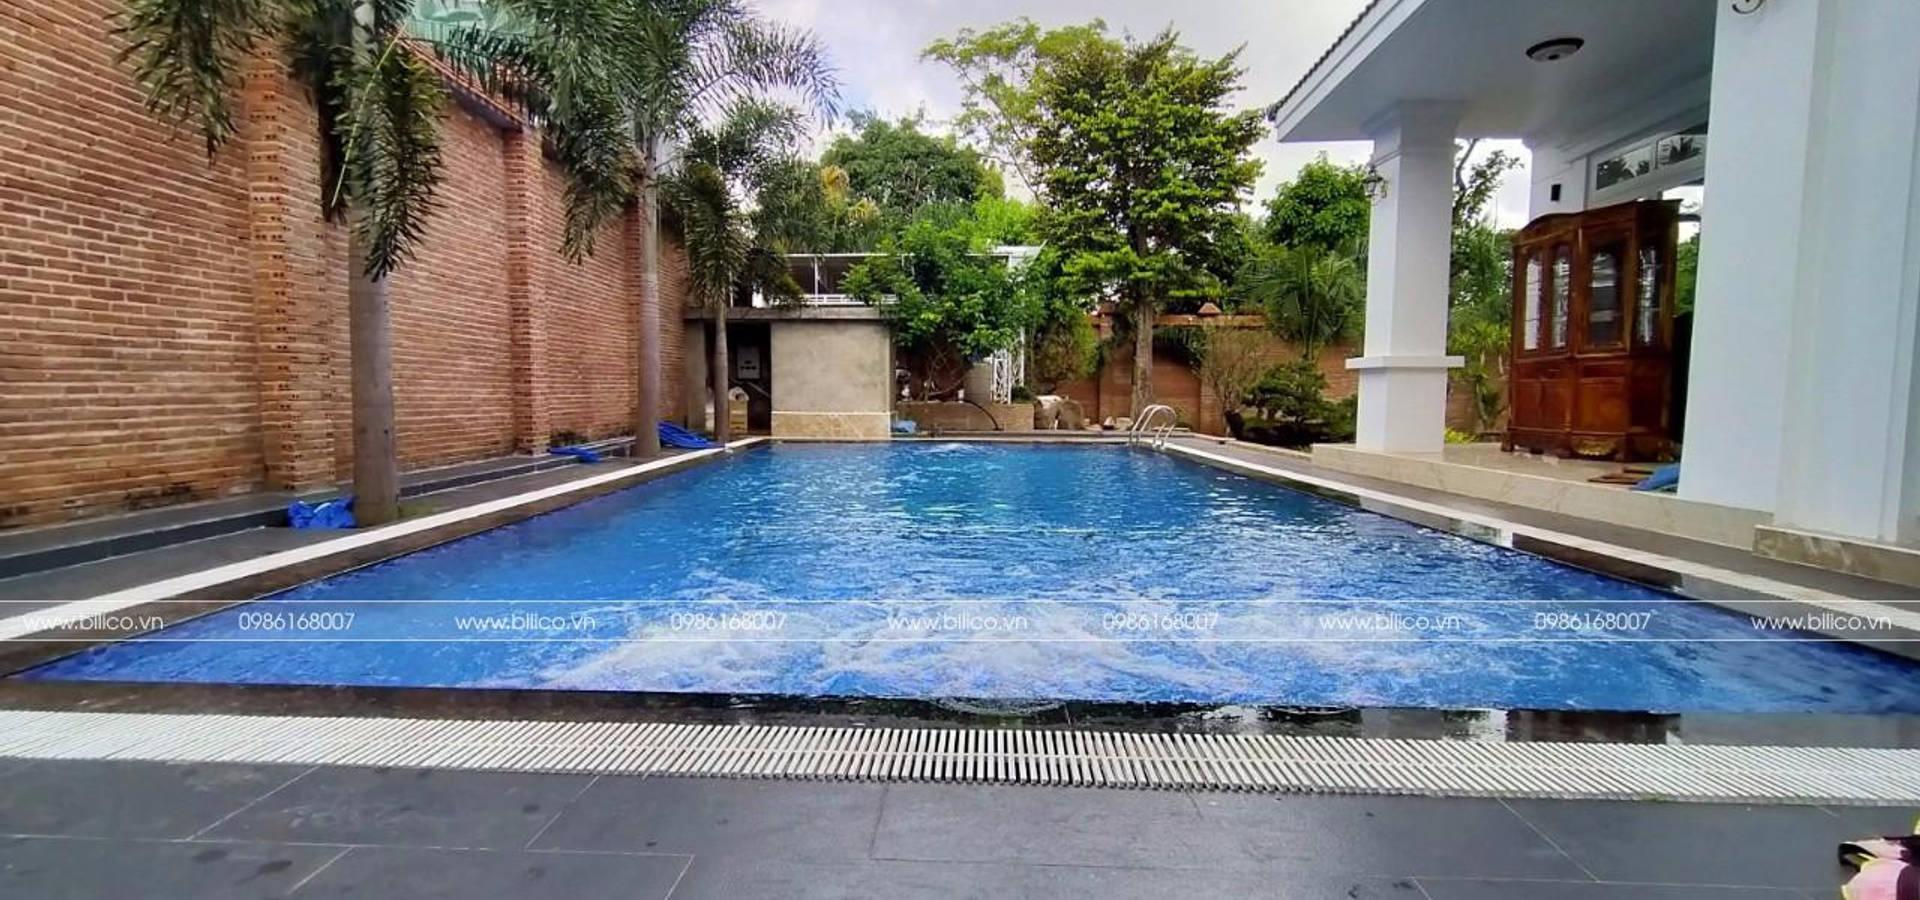 Thiết bị bể bơi Bilico